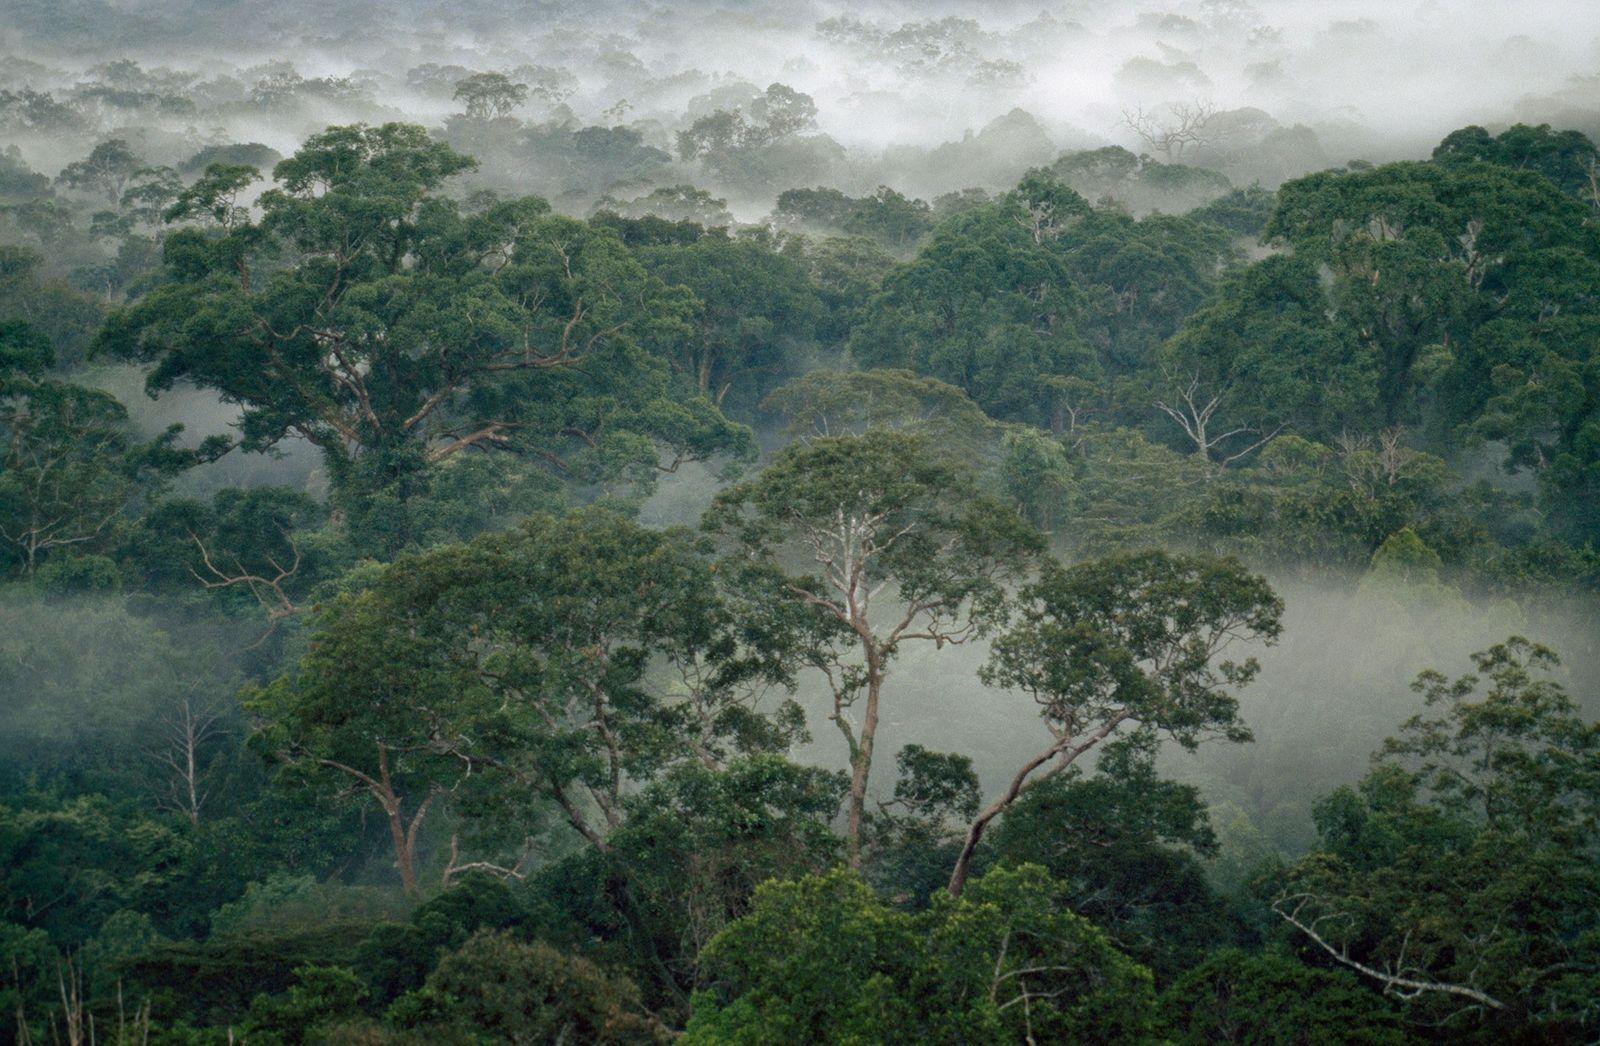 How termites help rainforests survive climate change